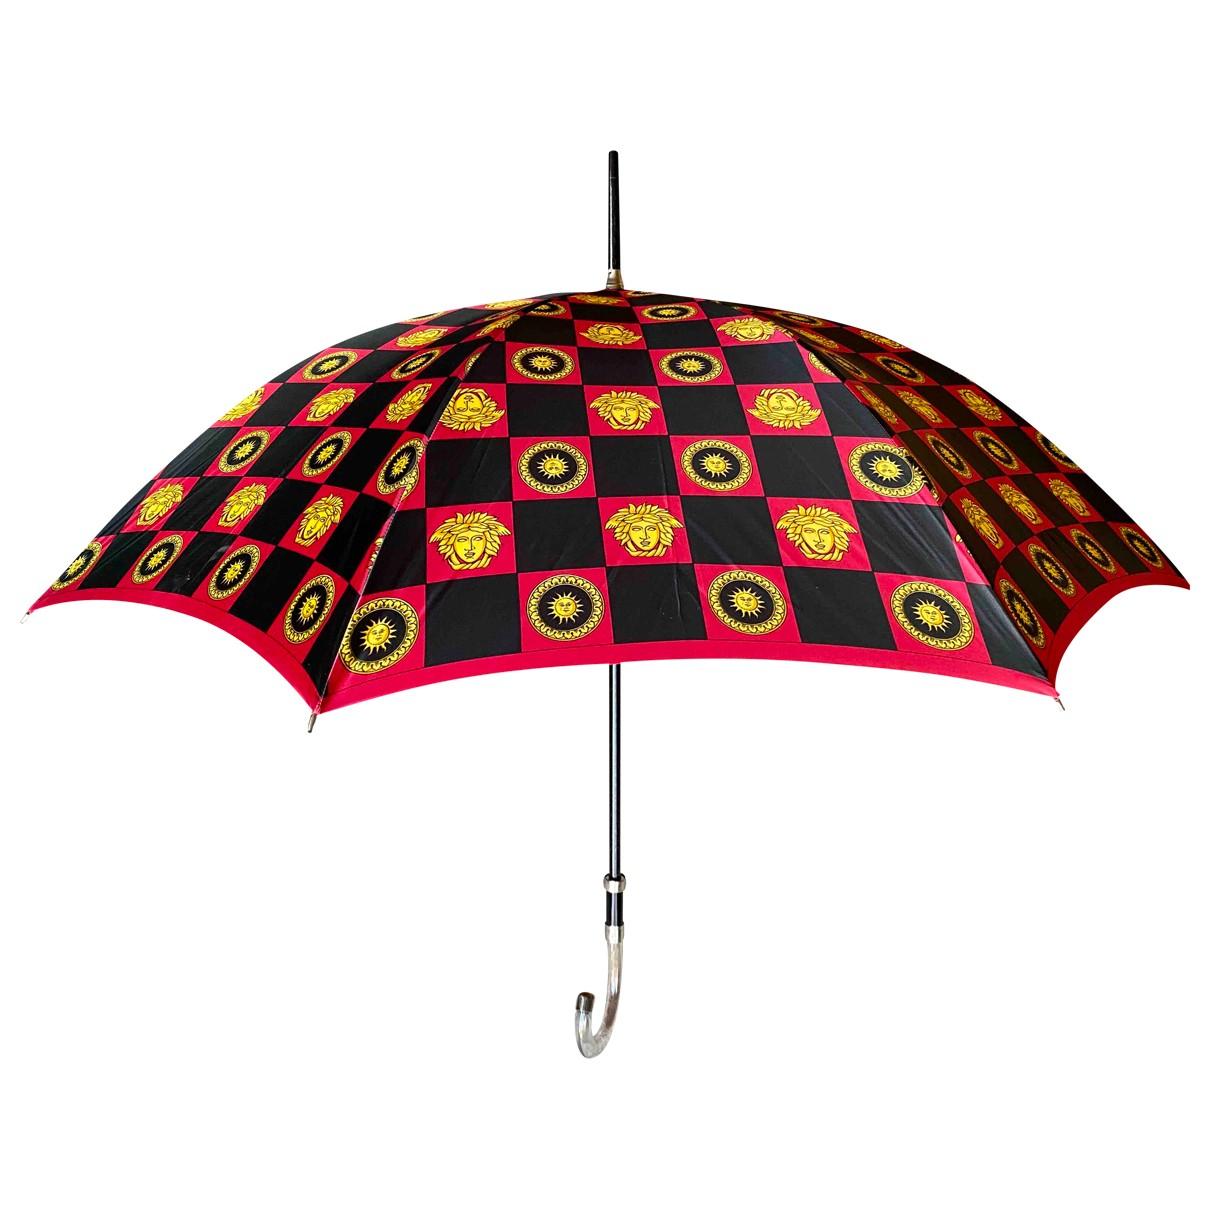 Paraguas Gianni Versace